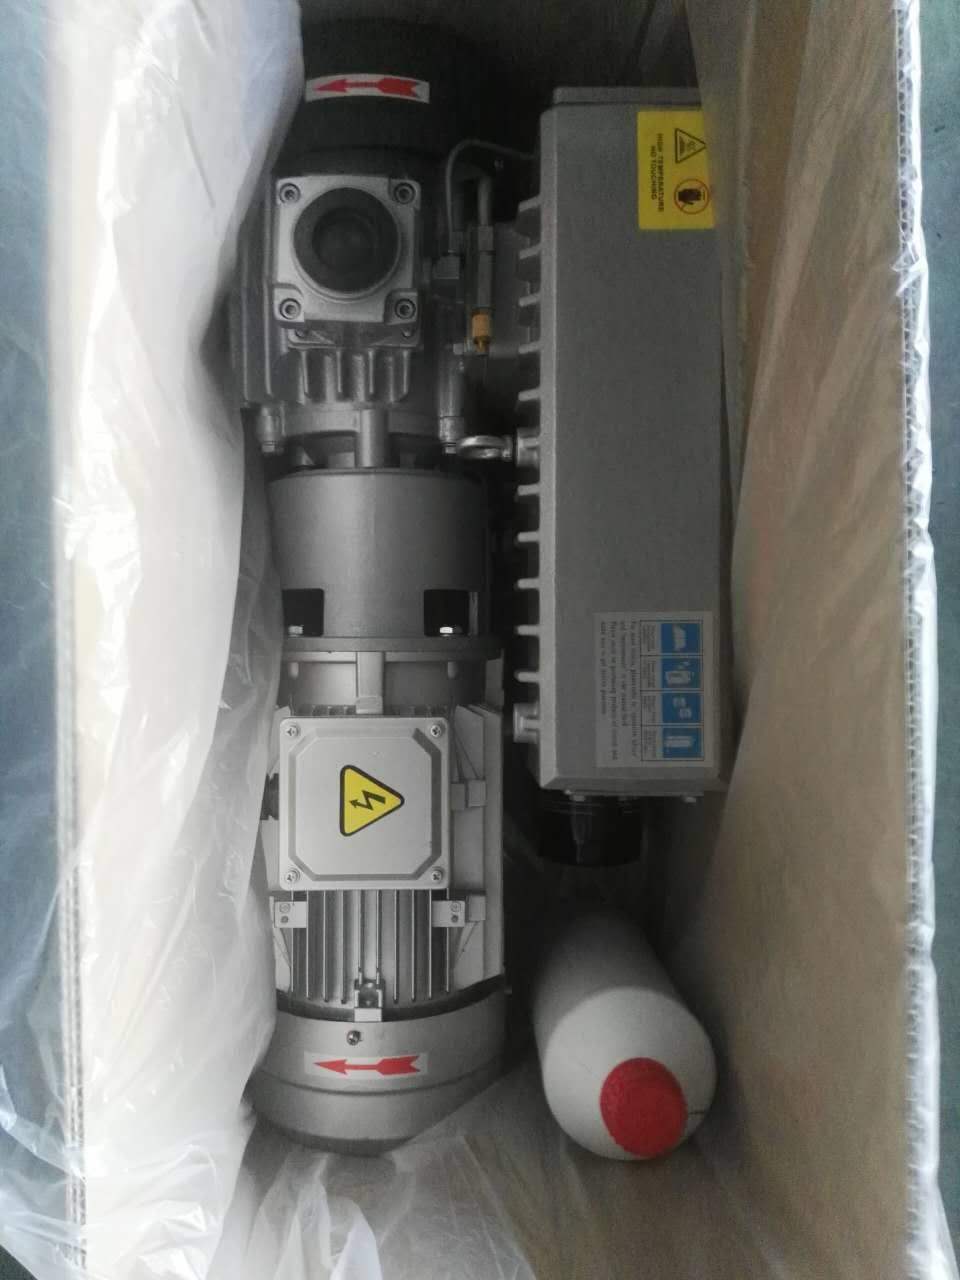 BlueStar XD-040 Rotary Vane Vacuum Pump Vacuum Packaging Machine Vacuum Pump Vacuum Pump (durable, 40m3 / h)  200PA  no oil no oil pump 2660cghi42 w006 long life small vacuum pump